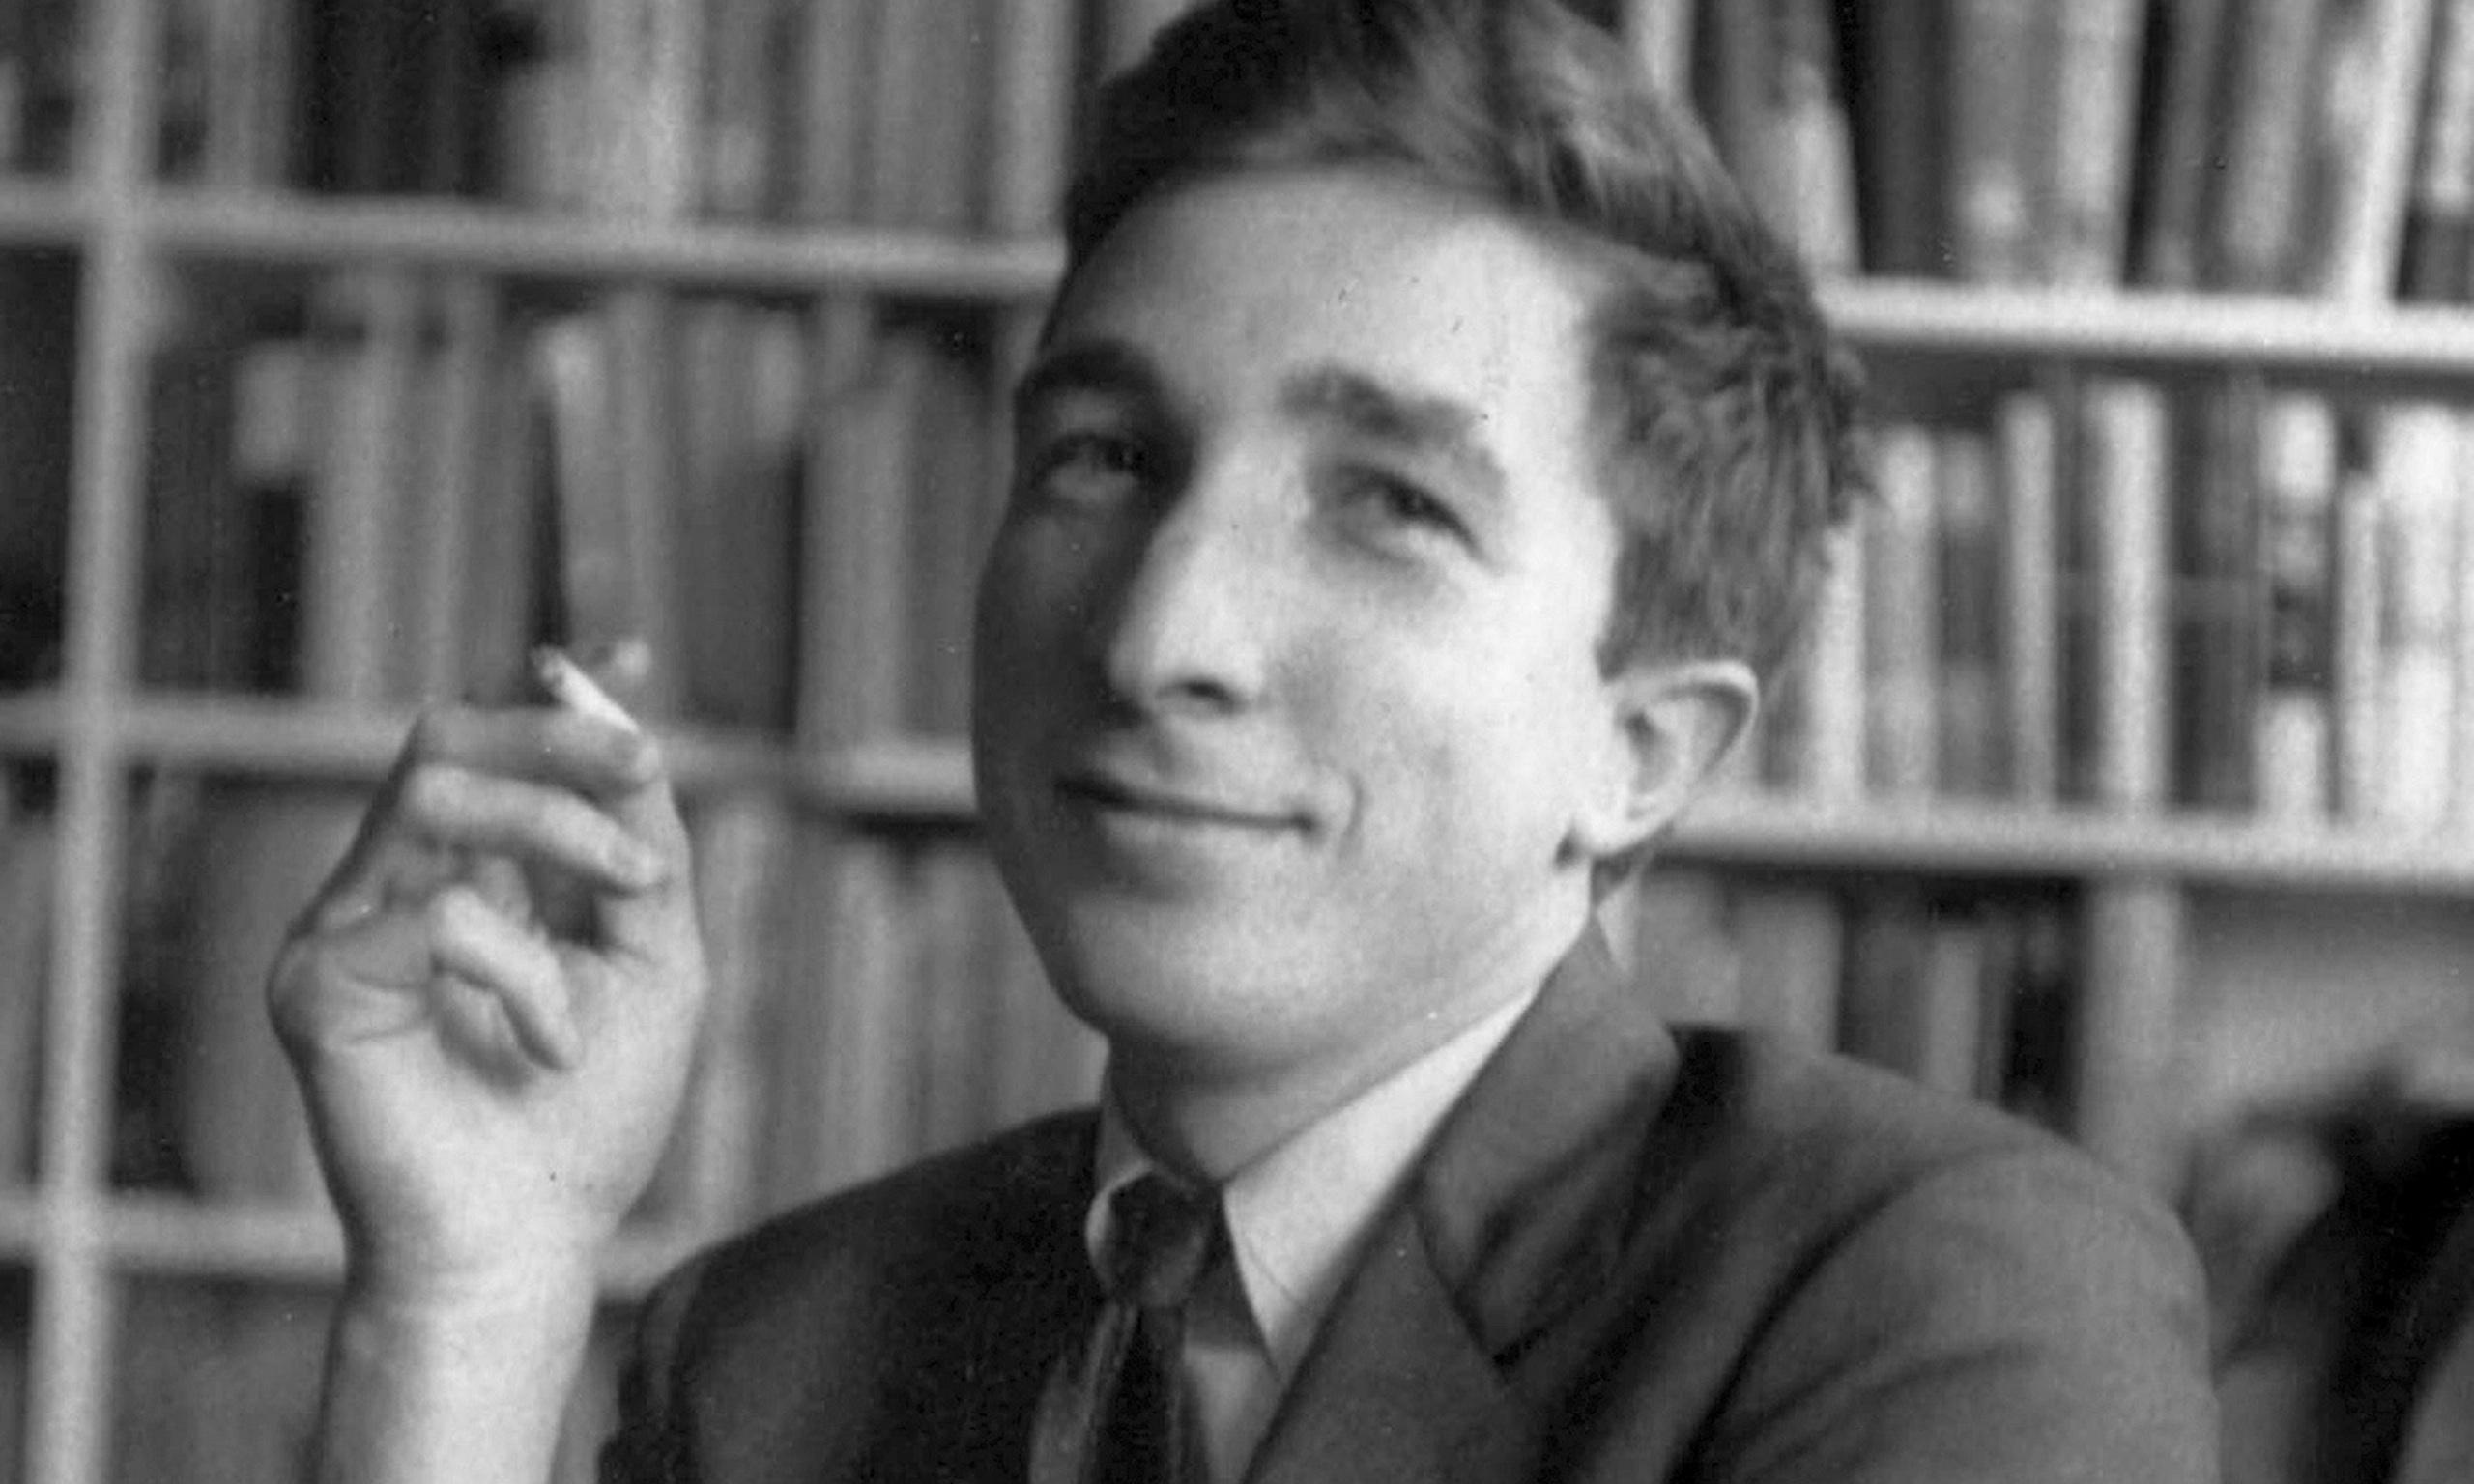 john updike the centaur John updike's wiki: john hoyer updike (march 18, 1932 – january 27,  in ipswich, updike wrote rabbit, run (1960), on a guggenheim fellowship, and the centaur.